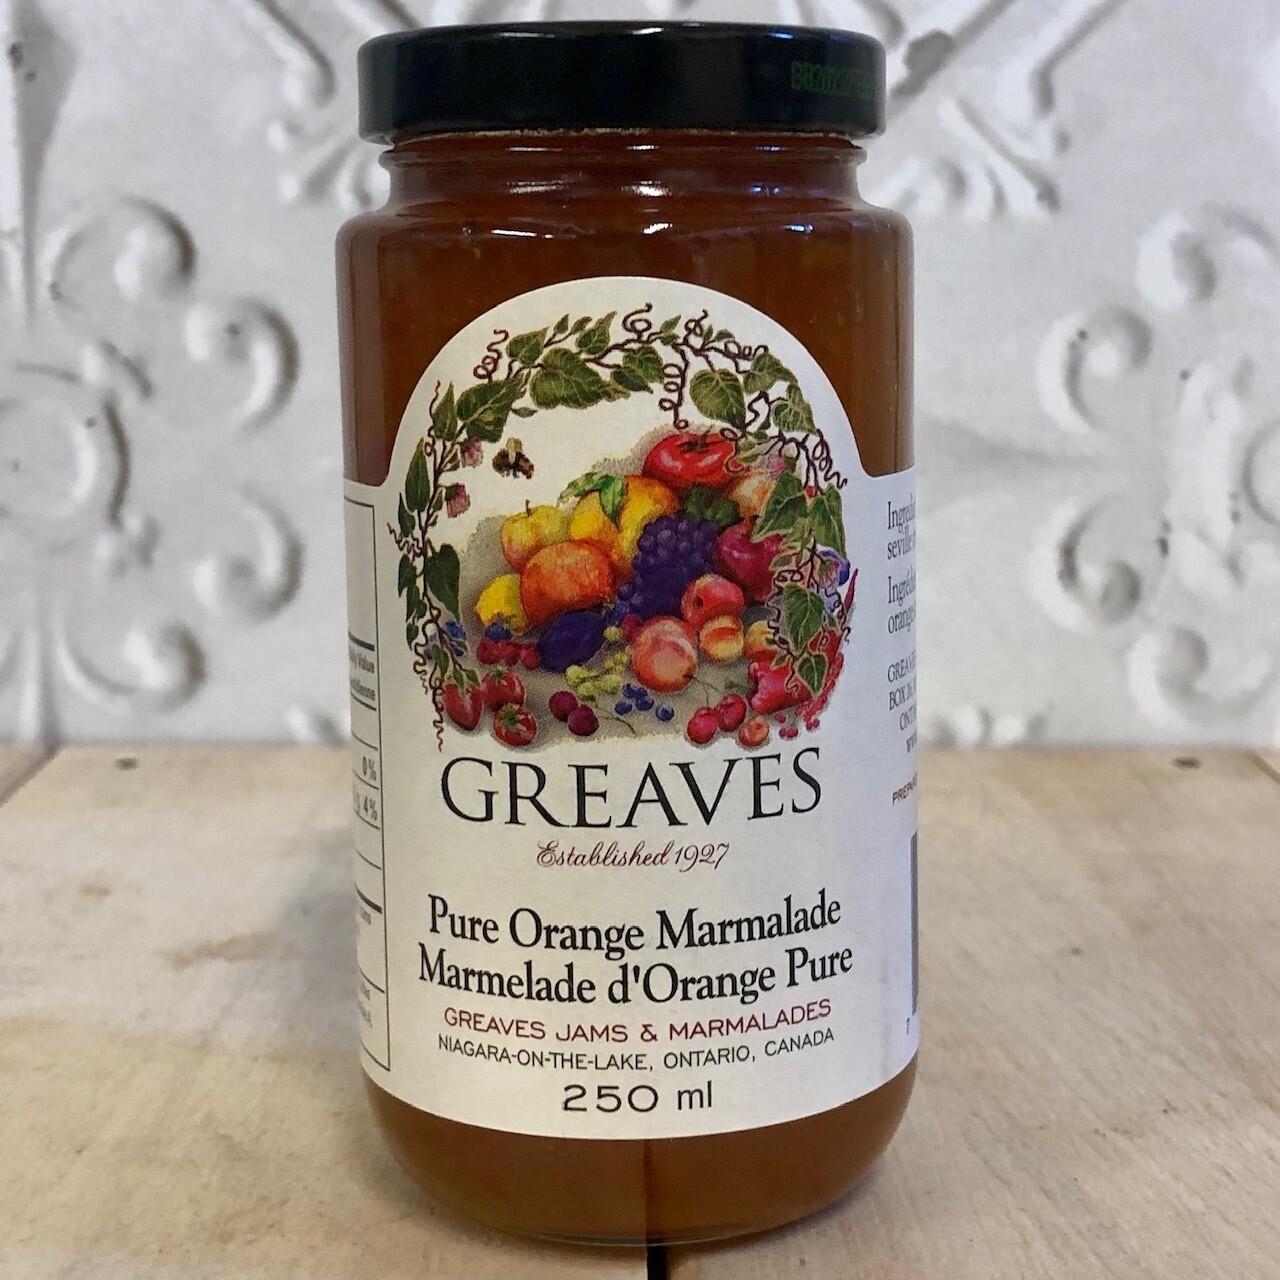 GREAVES Pure Orange Marmalade 250ml